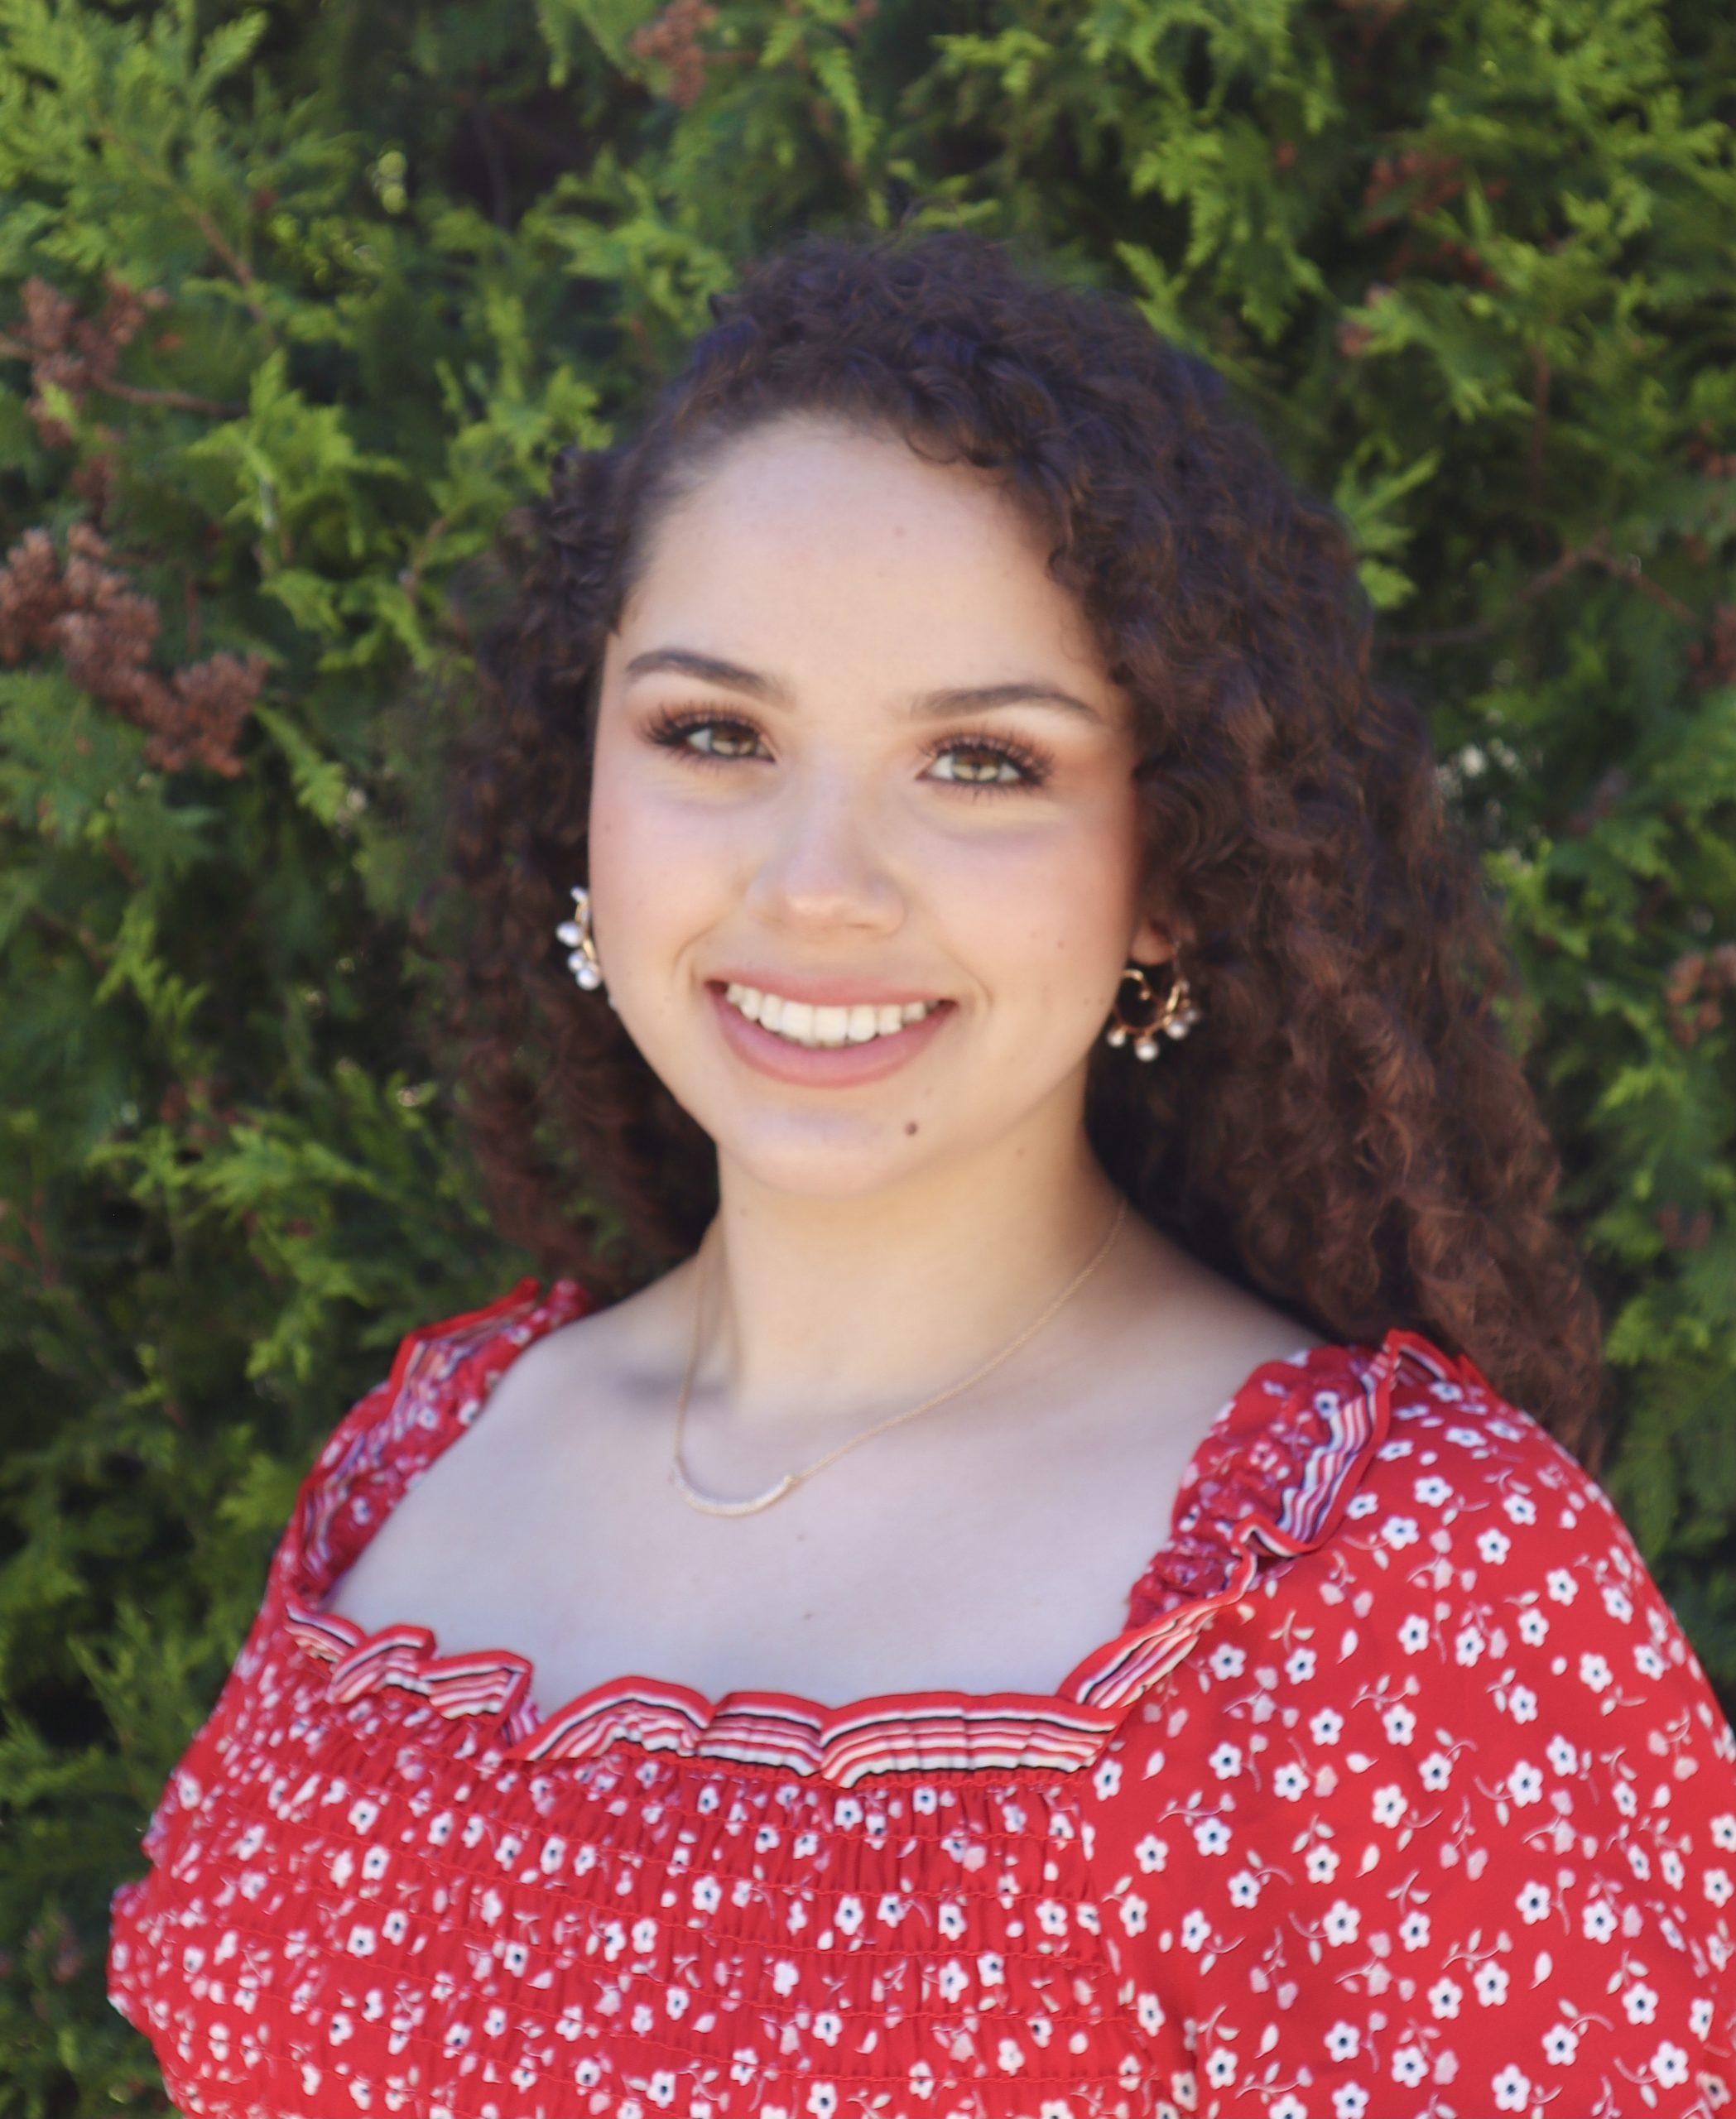 Jocelyn Vega-Robledo